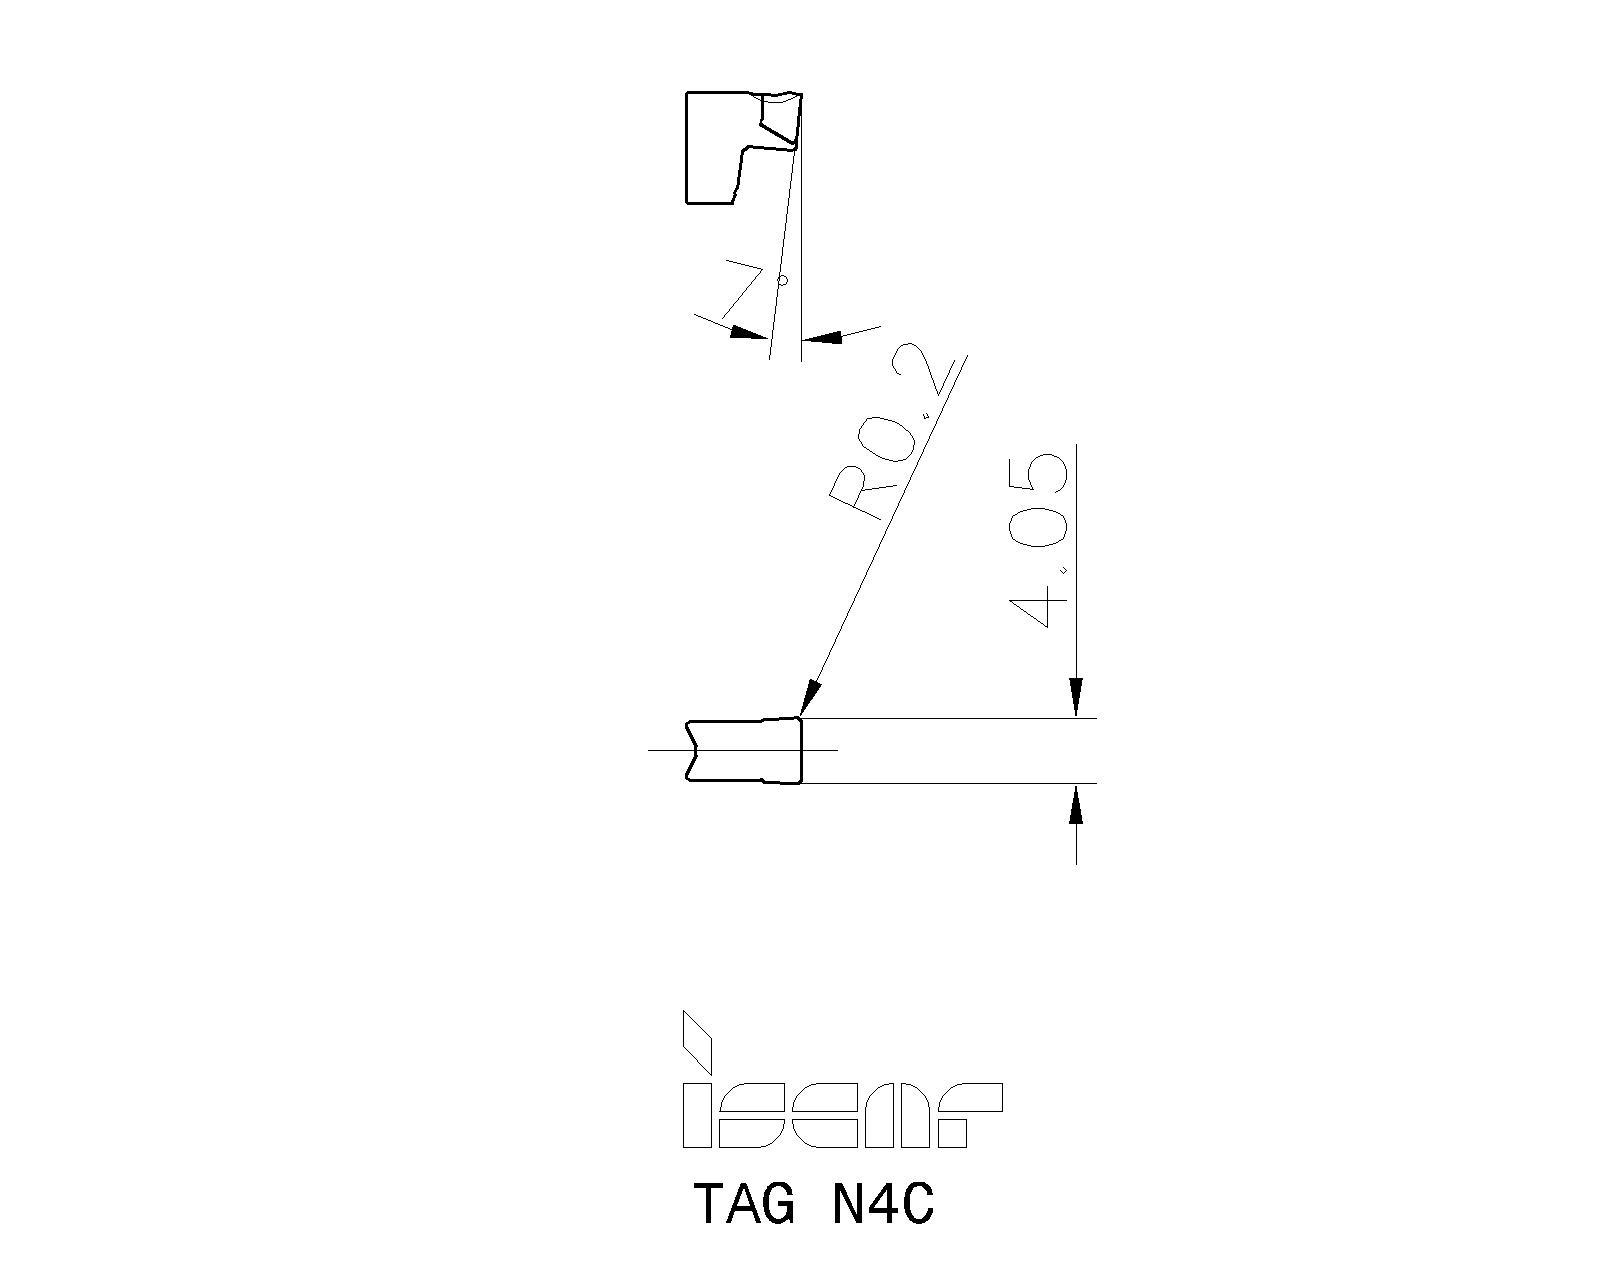 TAG N4C IC908